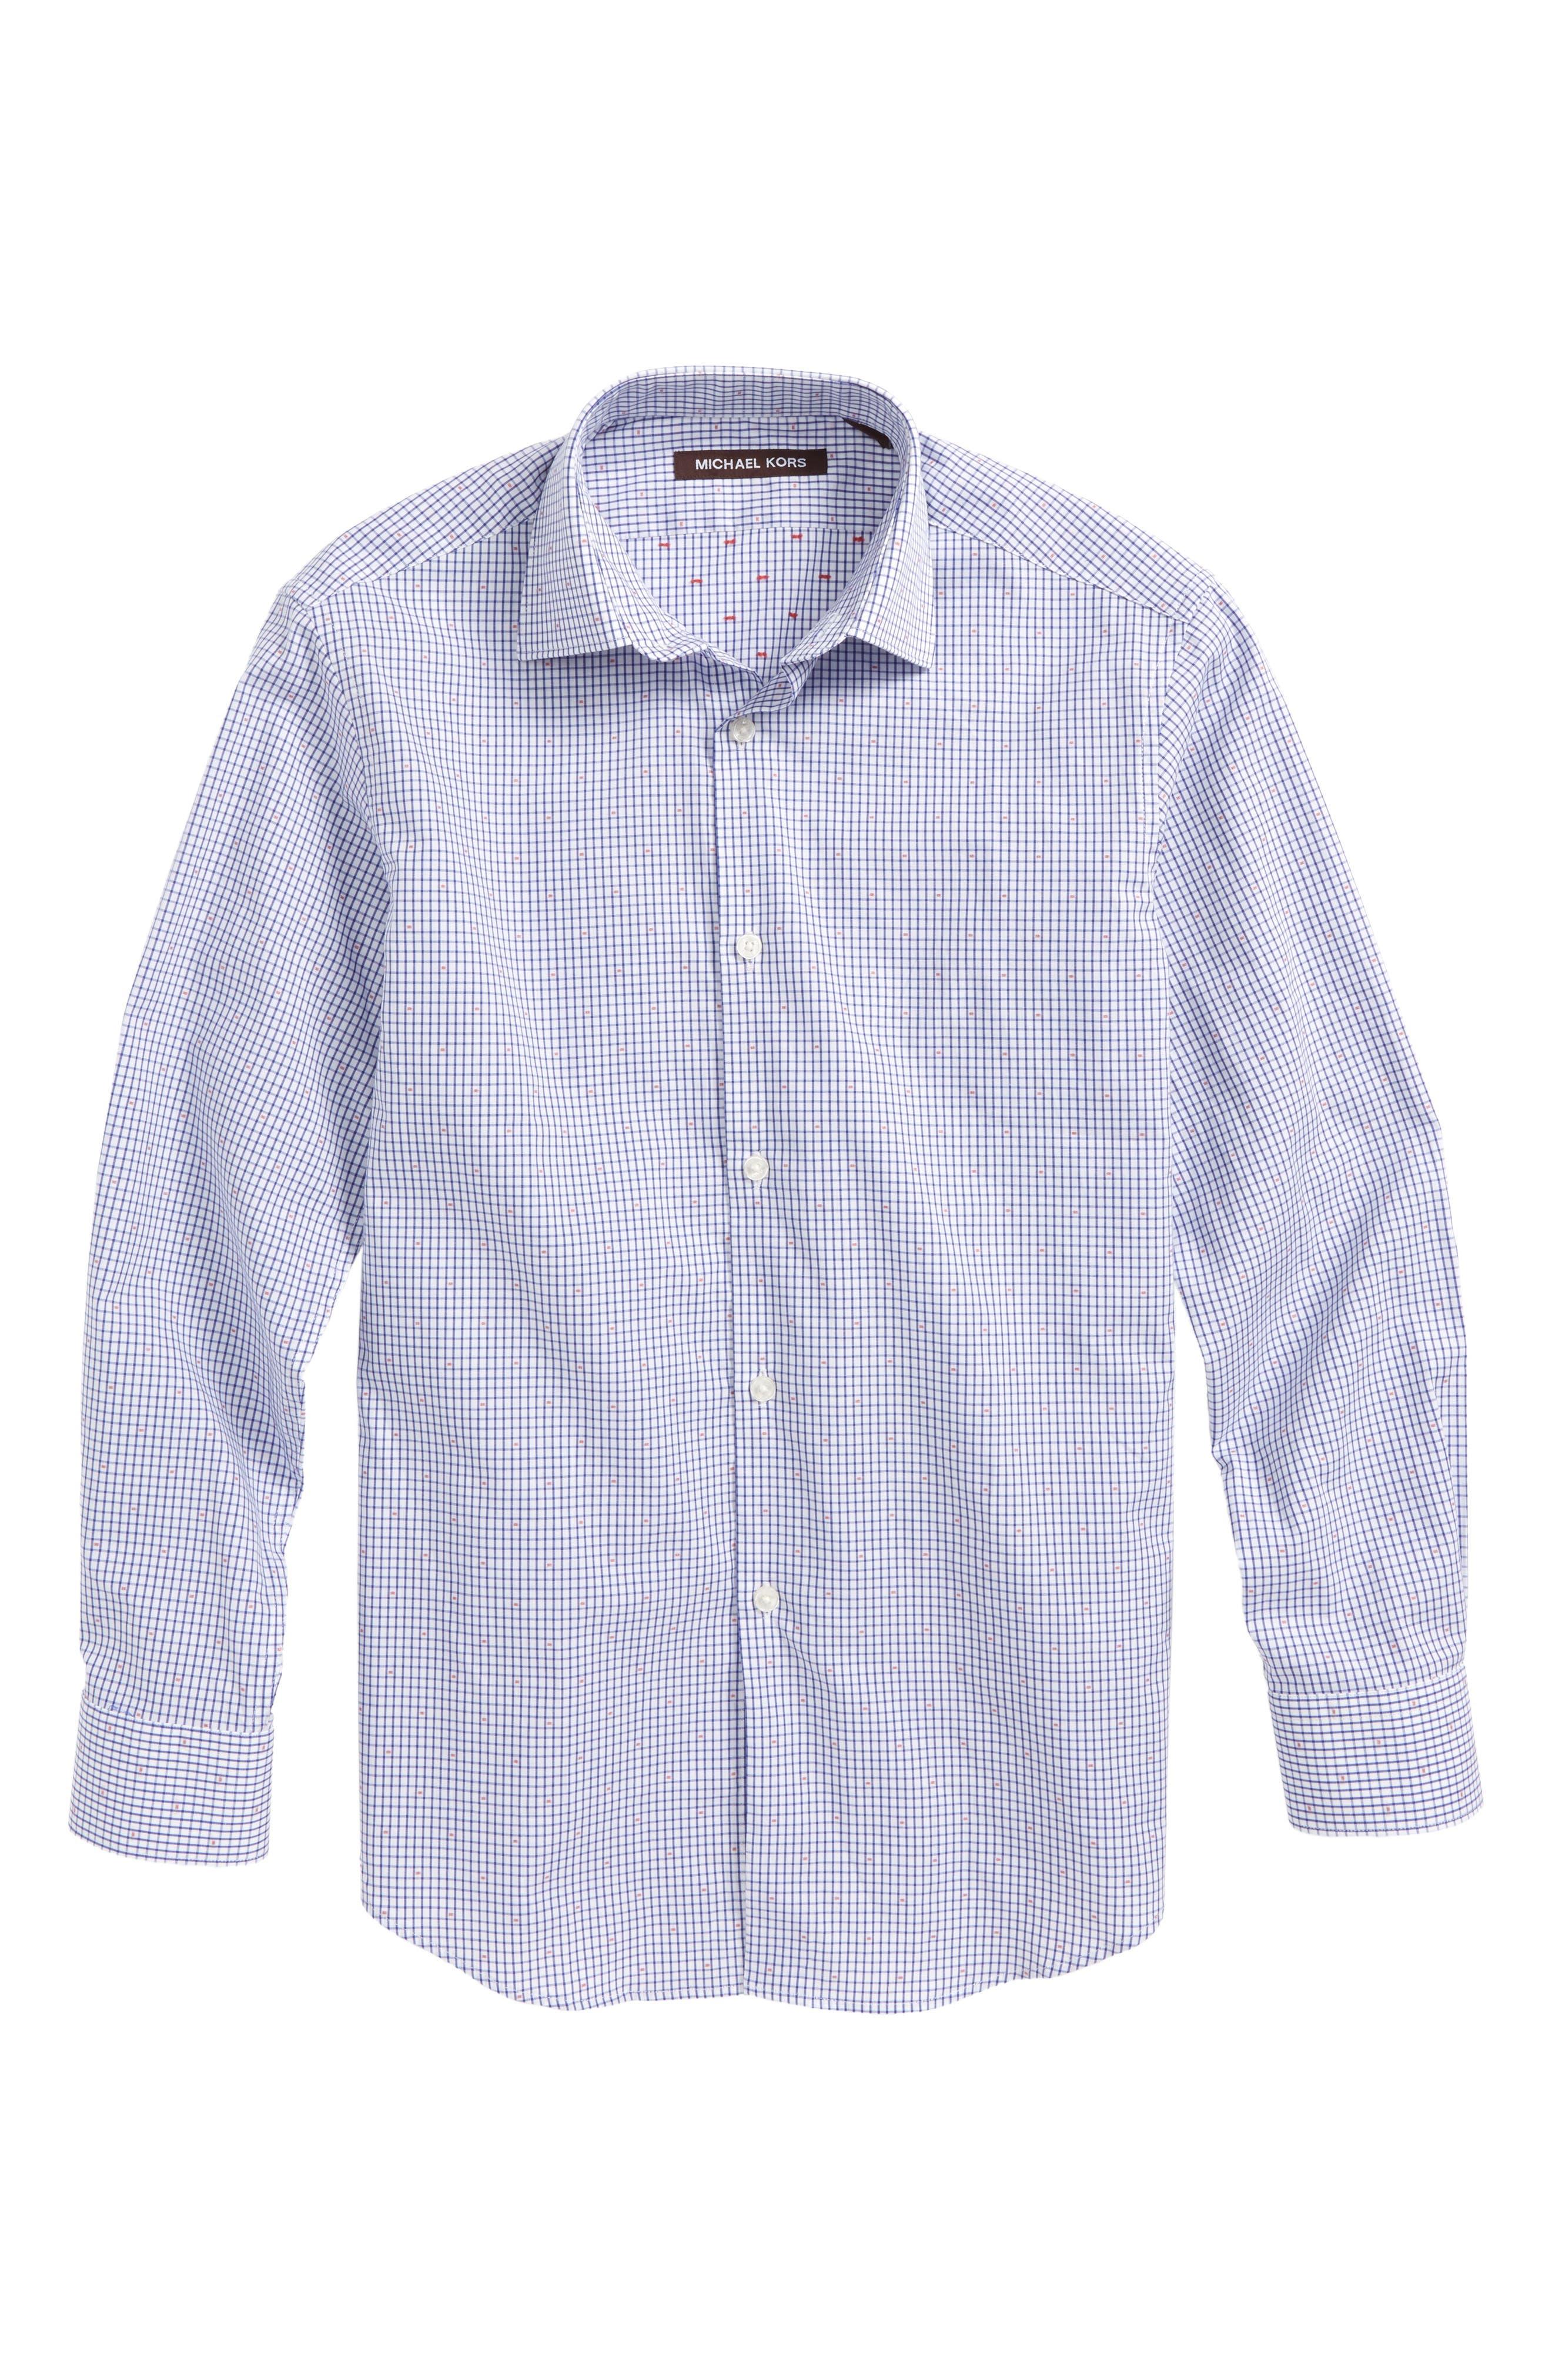 Mini Check Dress Shirt,                         Main,                         color, Blue/ White